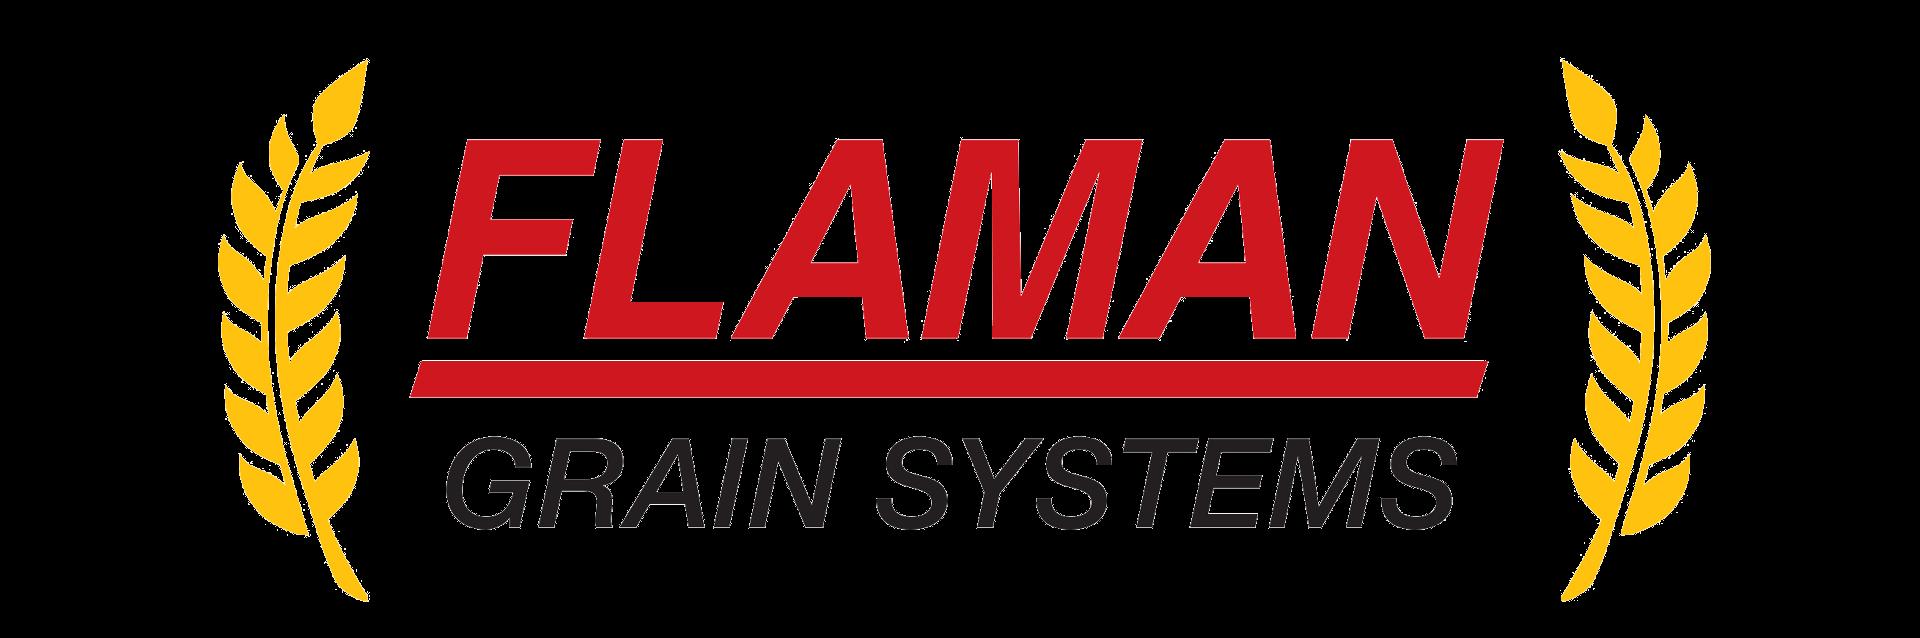 Grain Systems Equipment